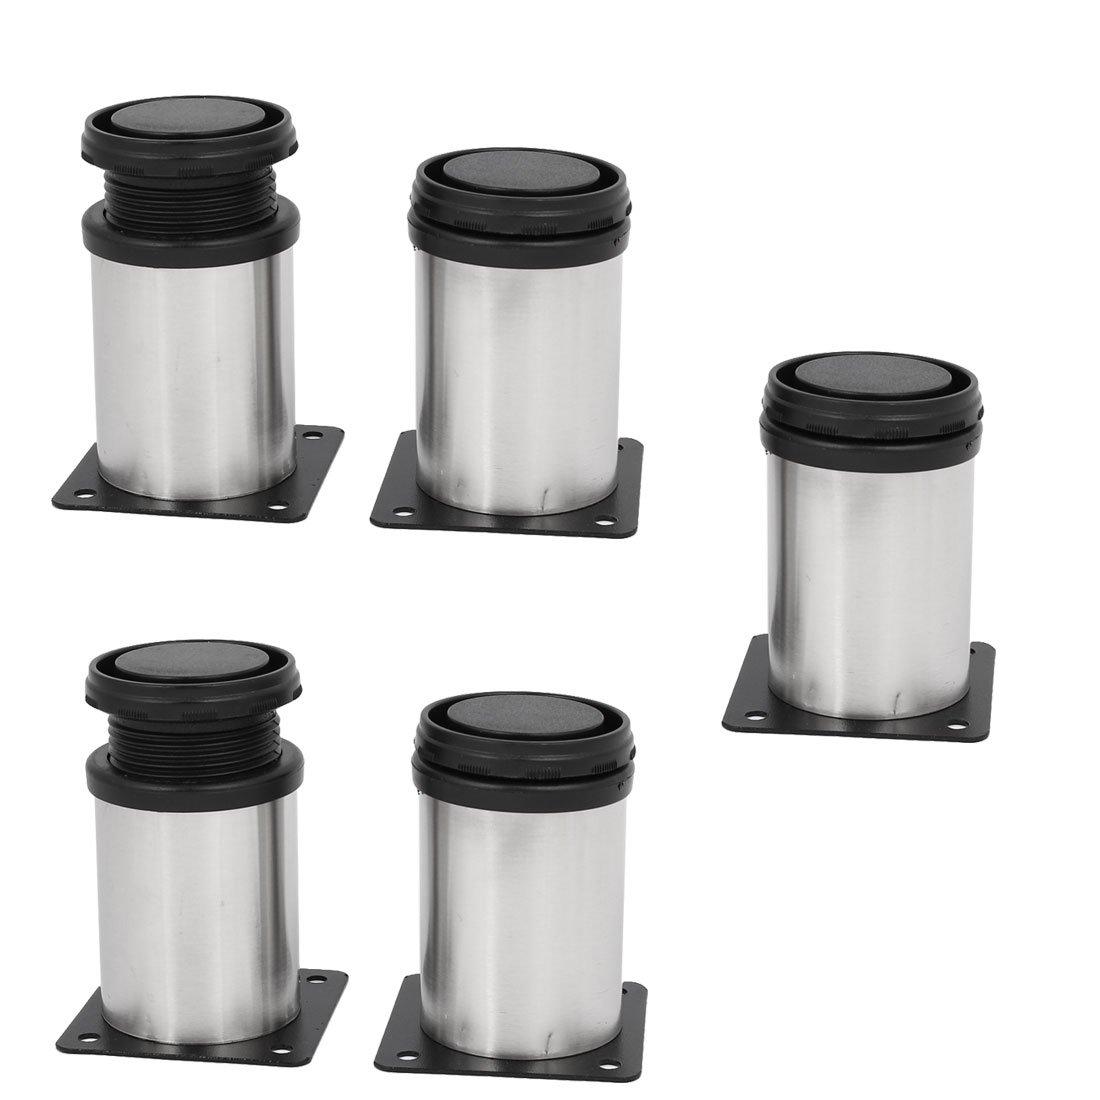 uxcell Kitchen Furniture Cabinet 50mm x 80mm Adjustable Feet Leg Round Stand 5PCS